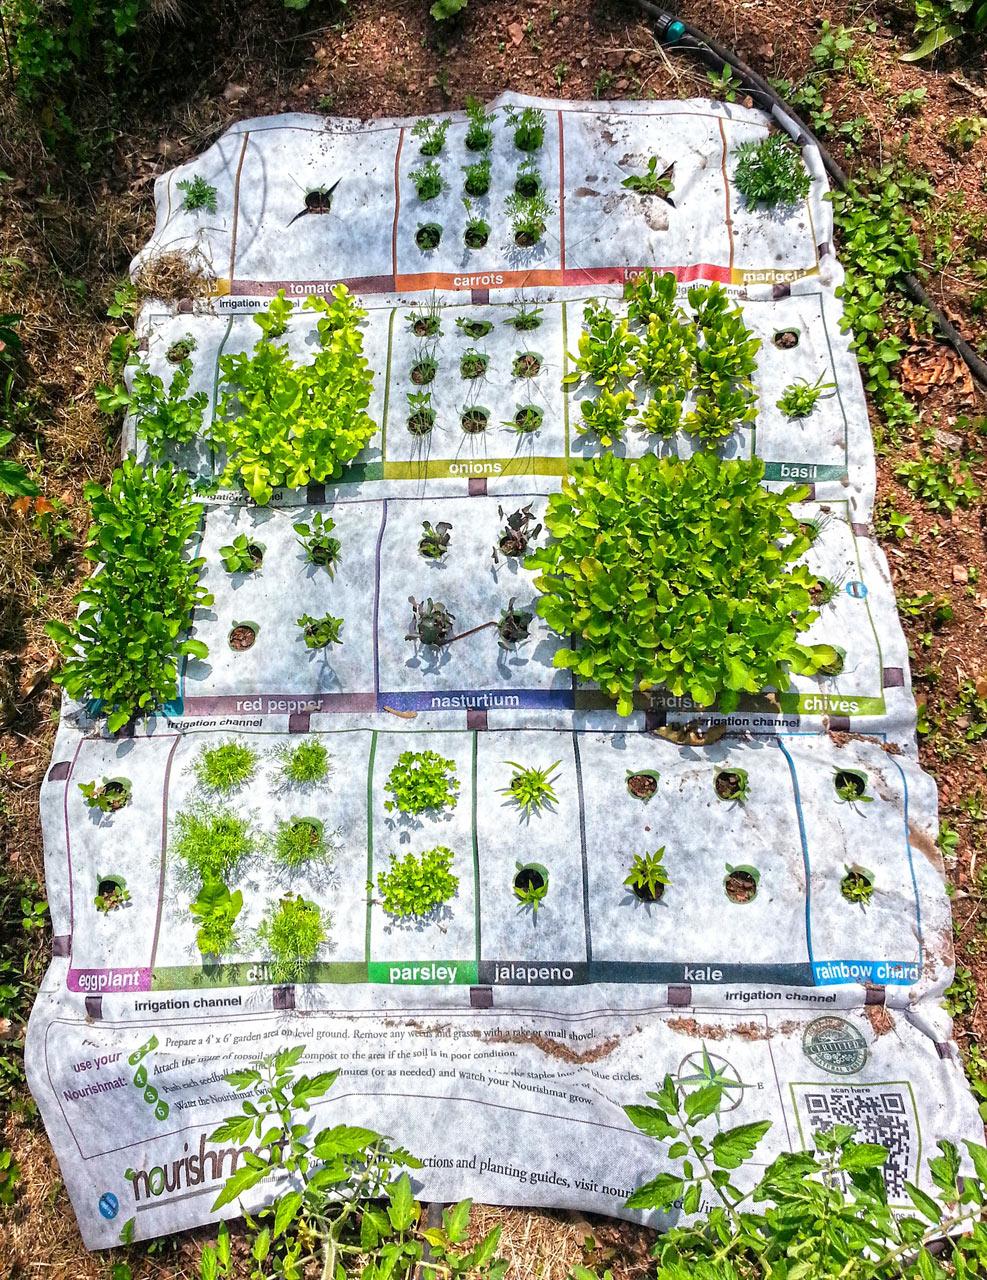 Nourishmat: Growing Your Own Food Just Got Super Easy